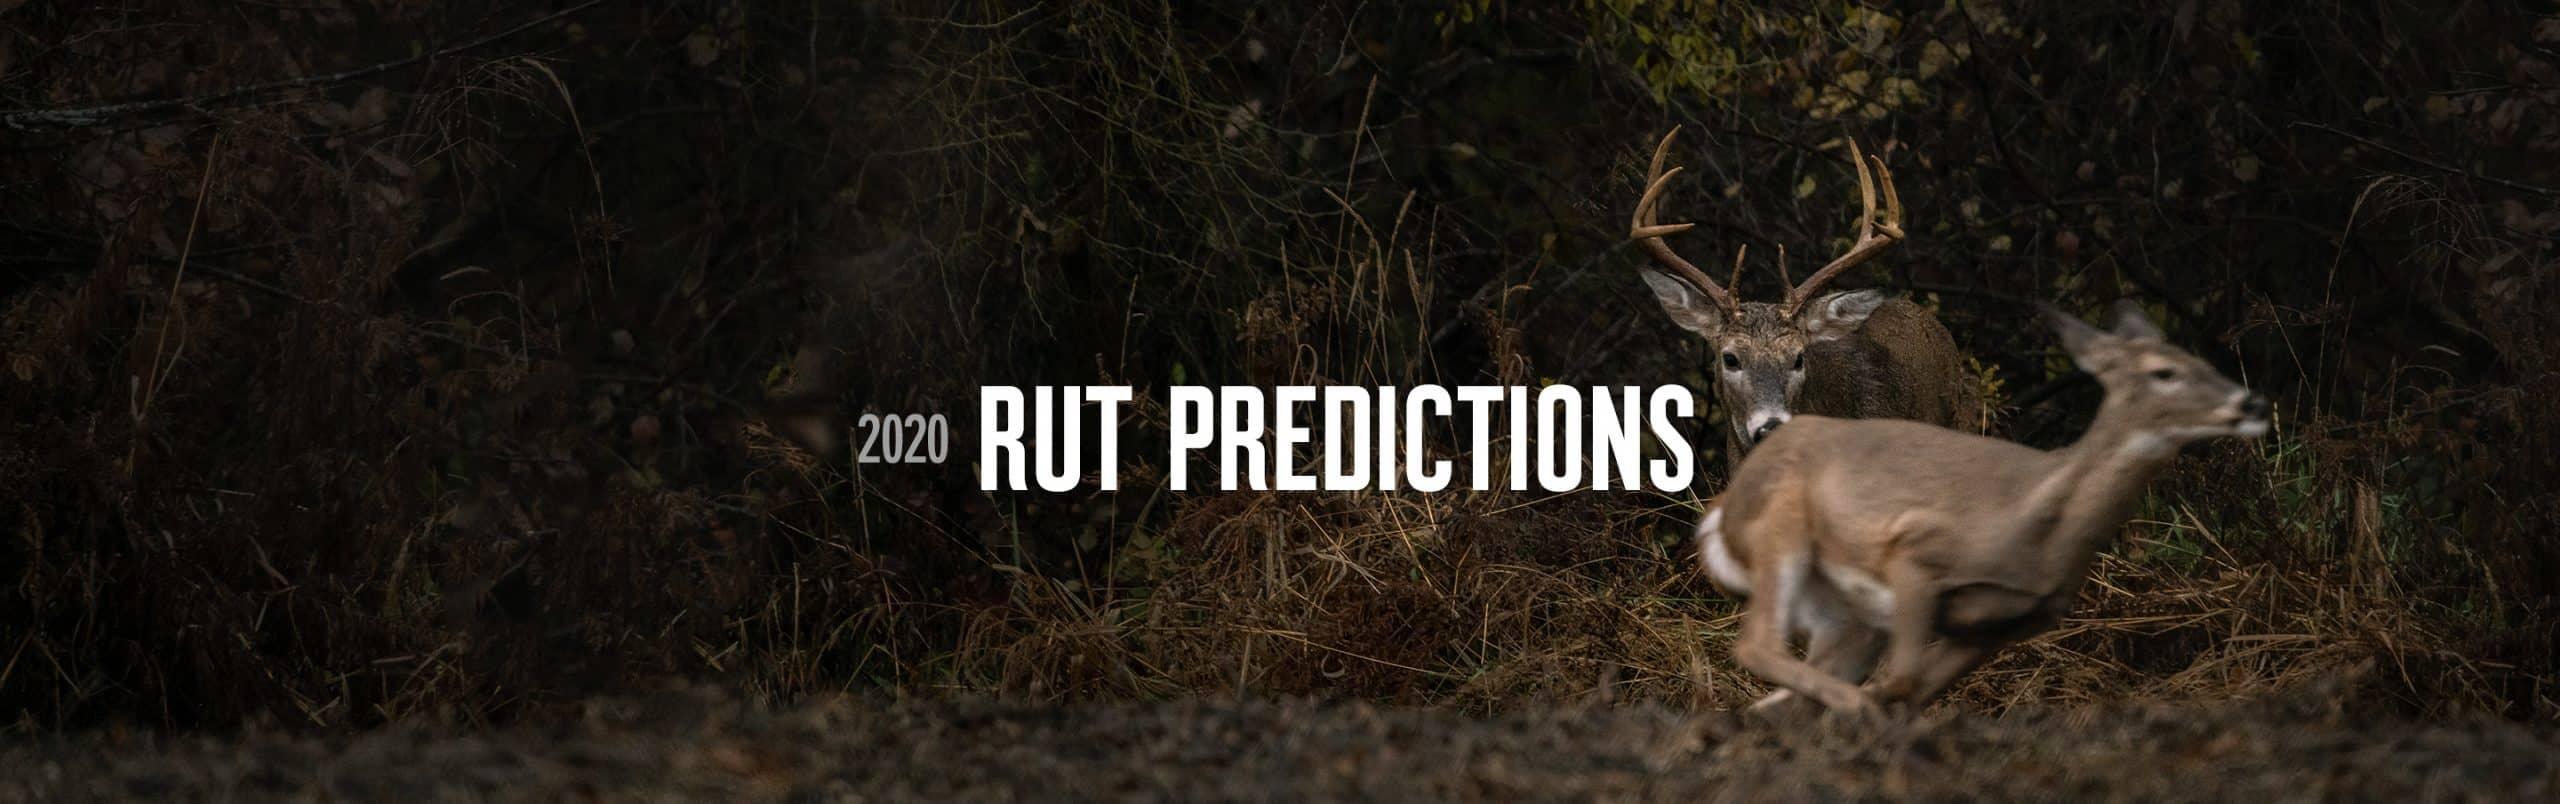 2020 Rut Predictions   Onx Maps for 2021 Illinois Rut Predictions